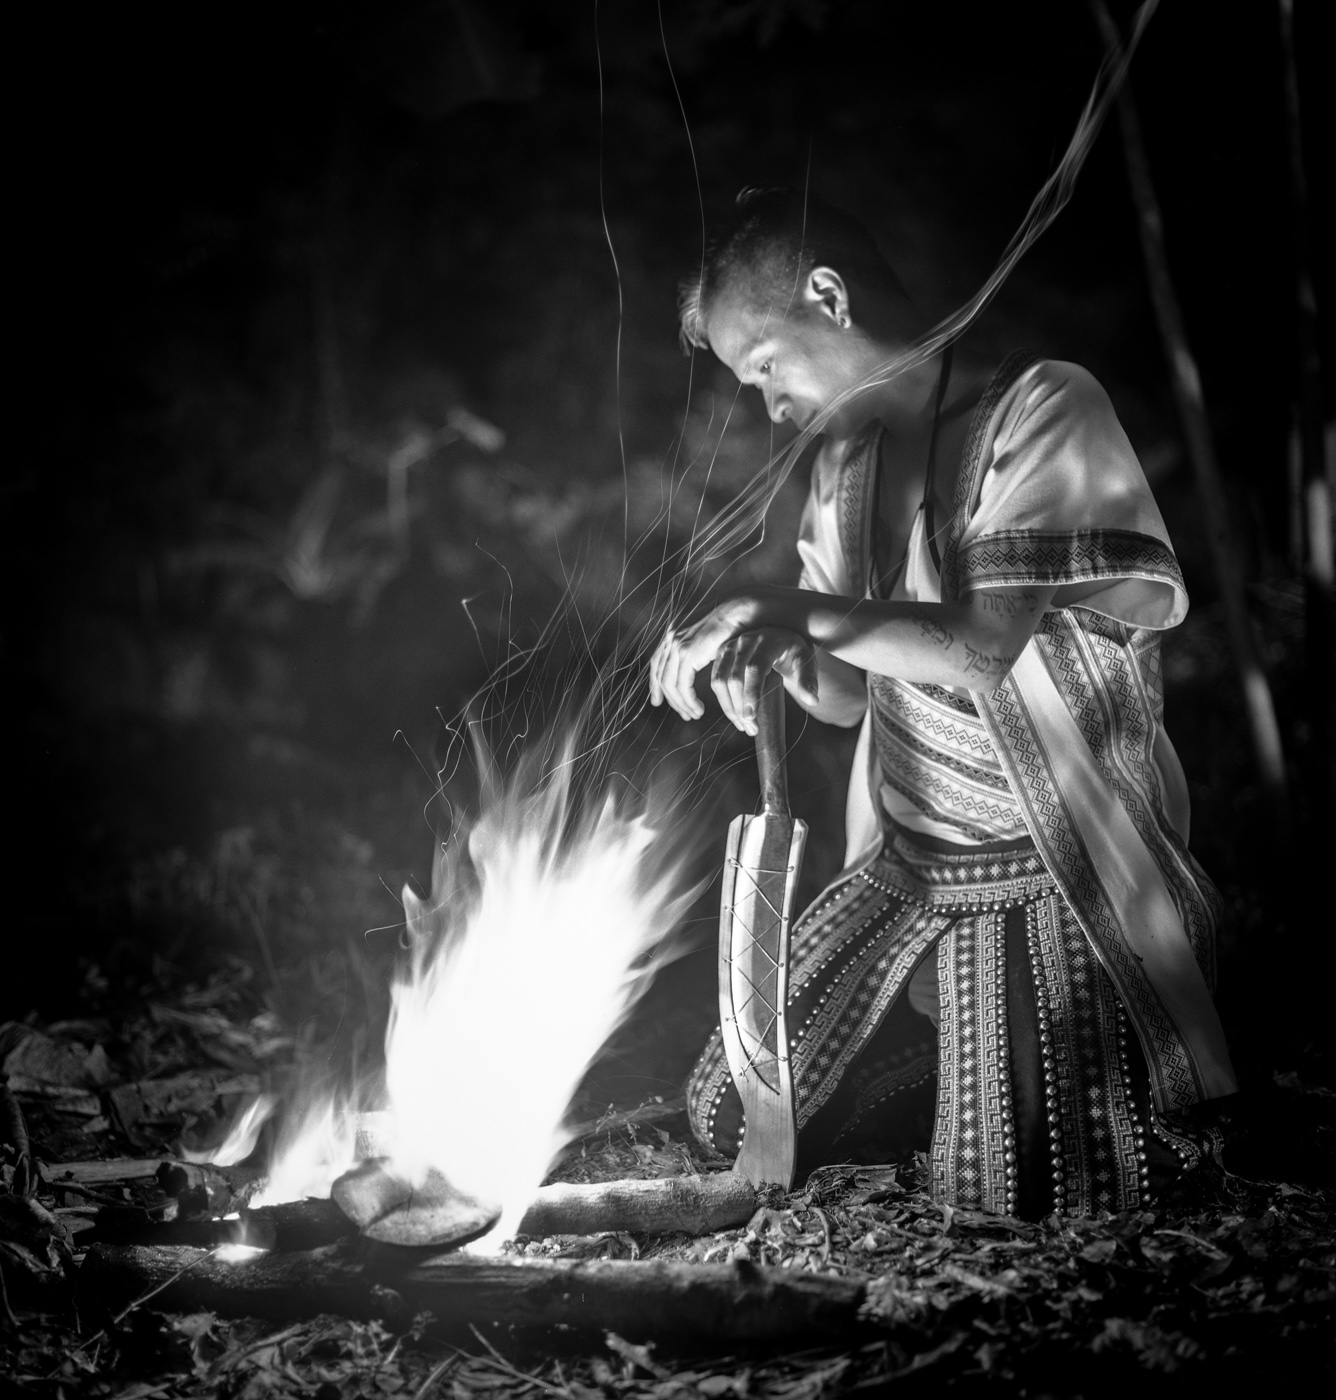 Hsuan_Chung_Formosa_Aborigines_02.jpg